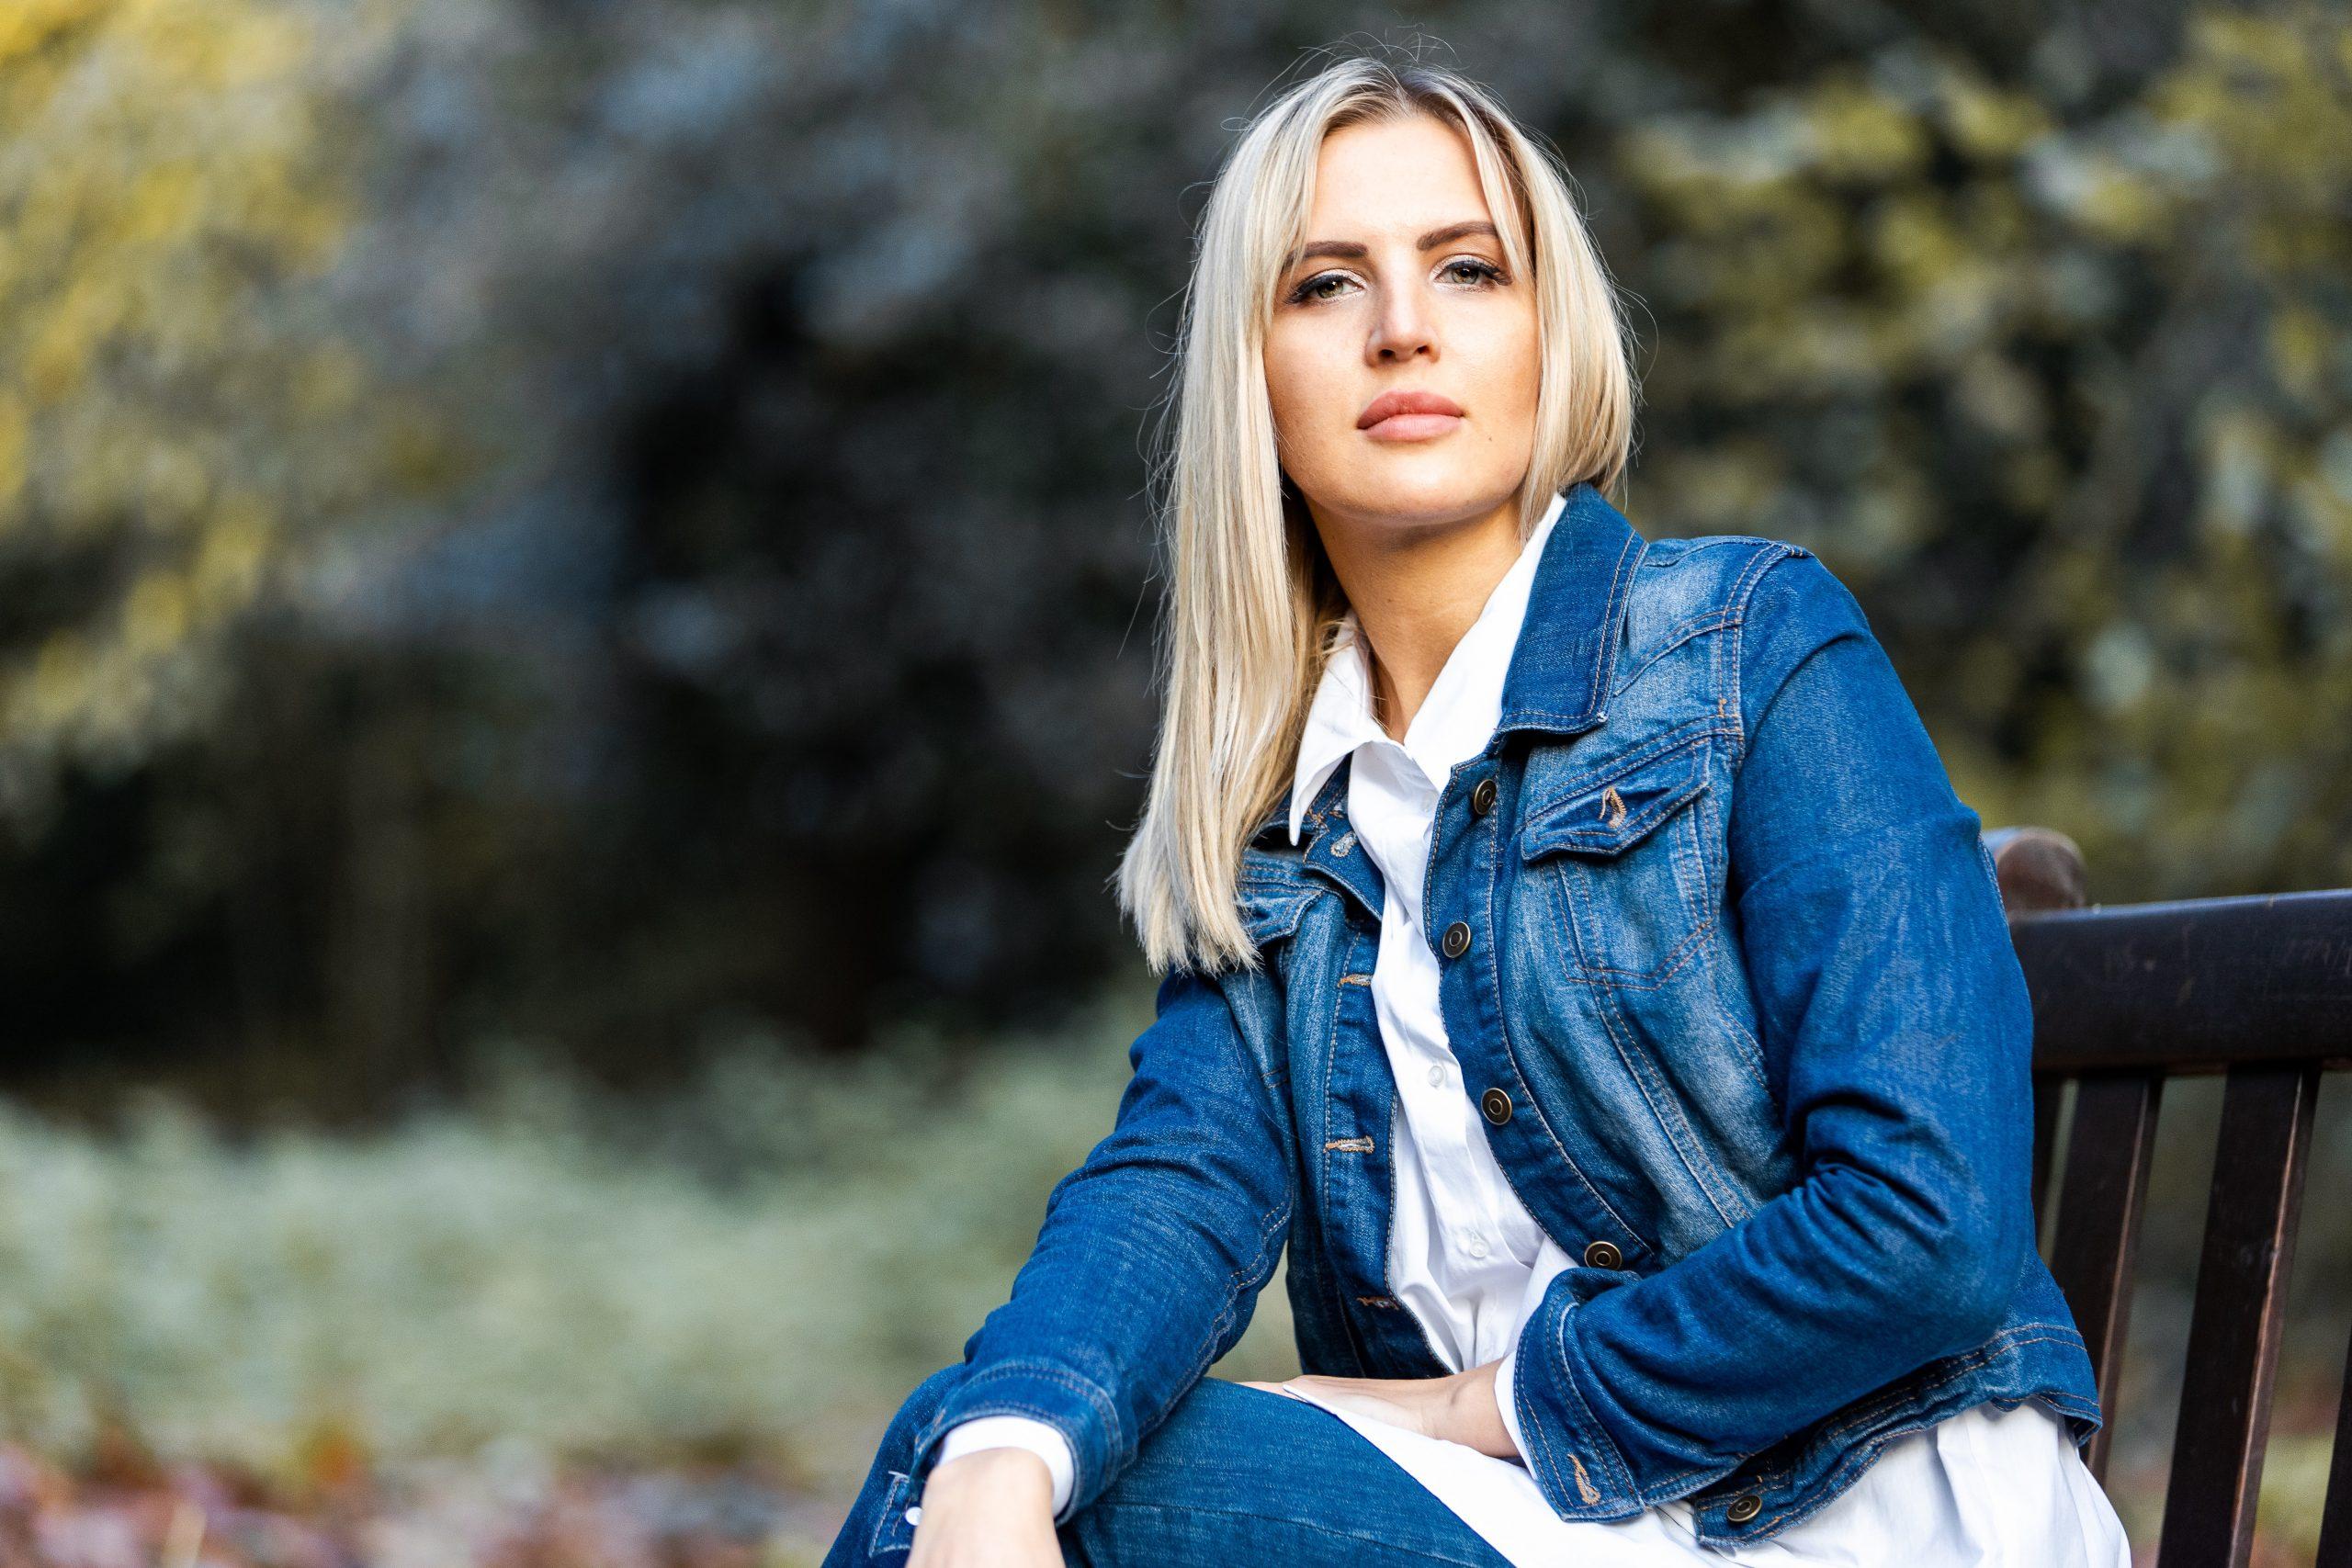 Model: Raminta Rusteikaite | Instagram: @Rami.rrus | Contact info@edwardhowell.photography for information.